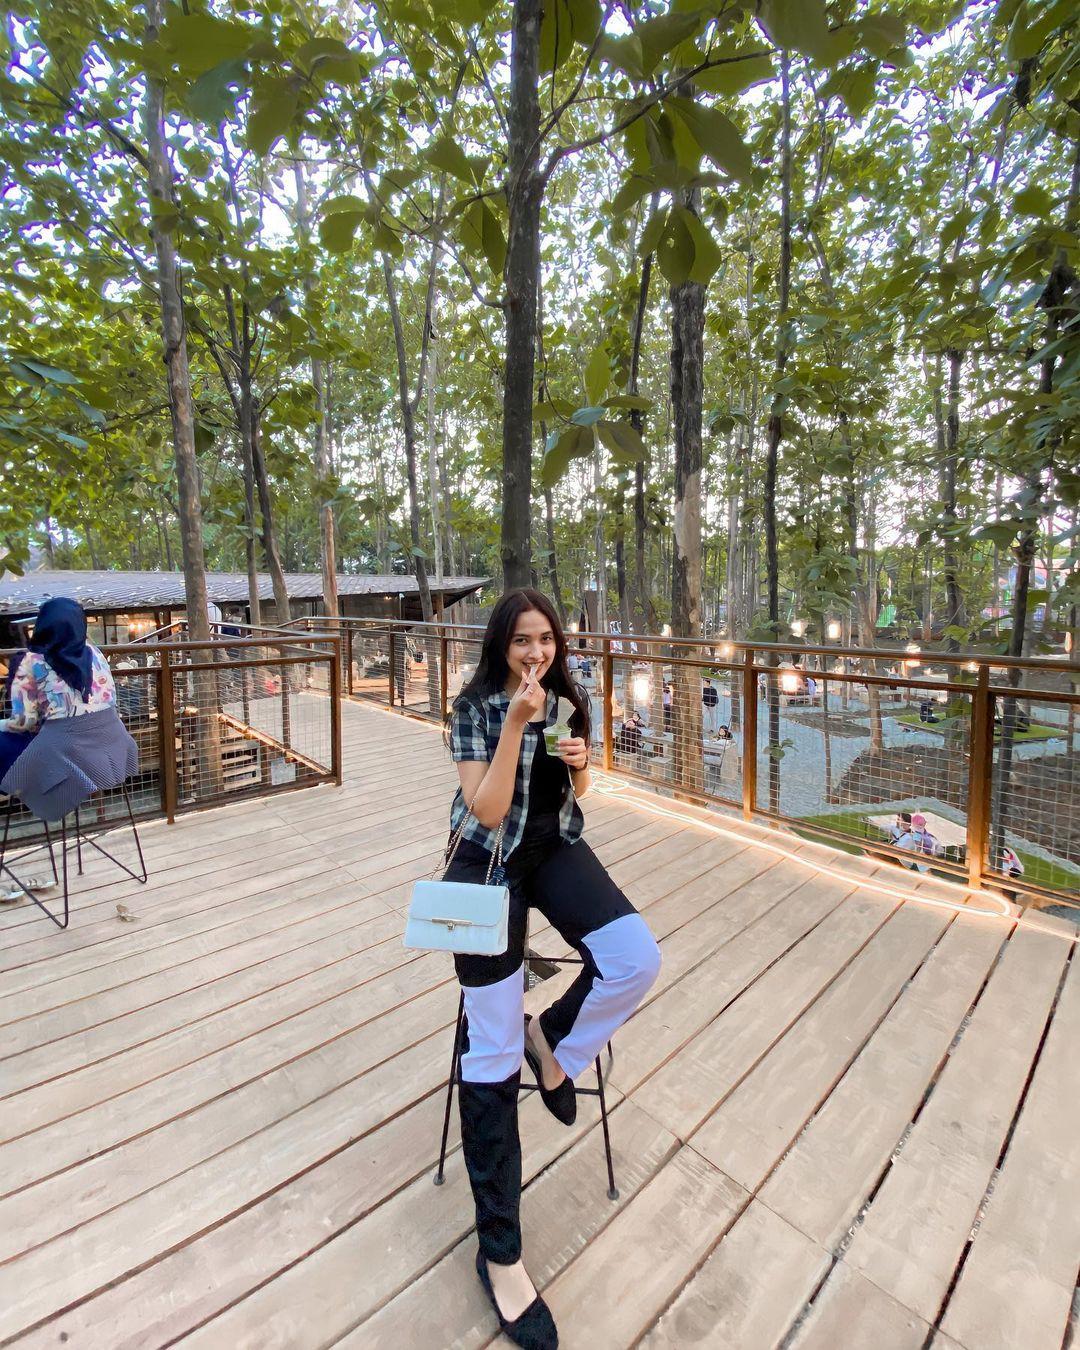 Menu Hutan Jati Cafe & Gelato Purwakarta